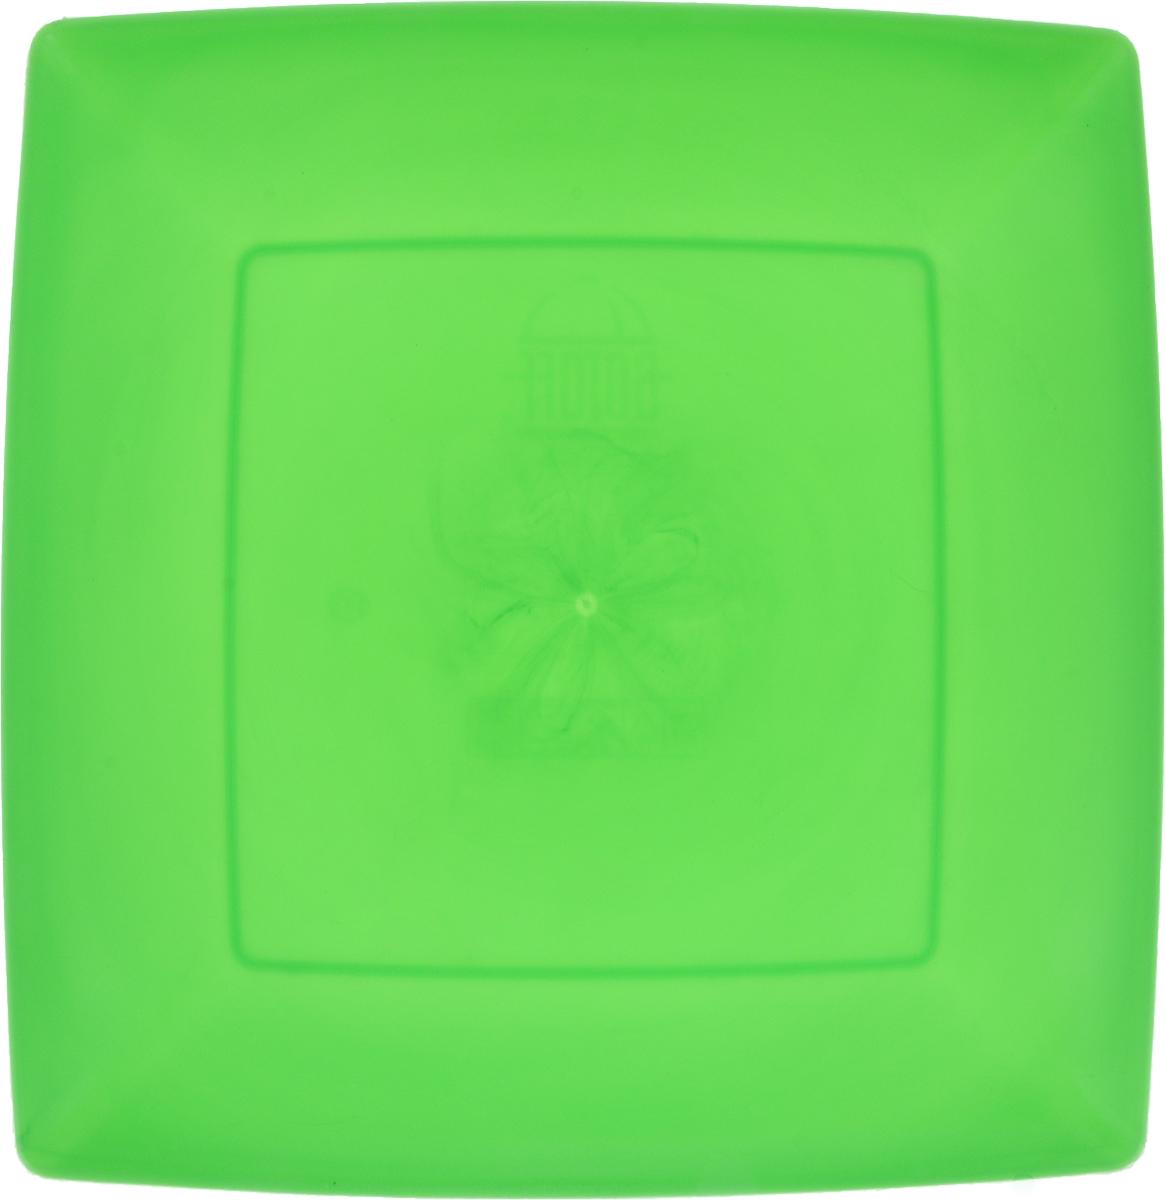 Тарелка Gotoff, цвет: зеленый, 23,5 х 23,5 смWTC-633_зеленый